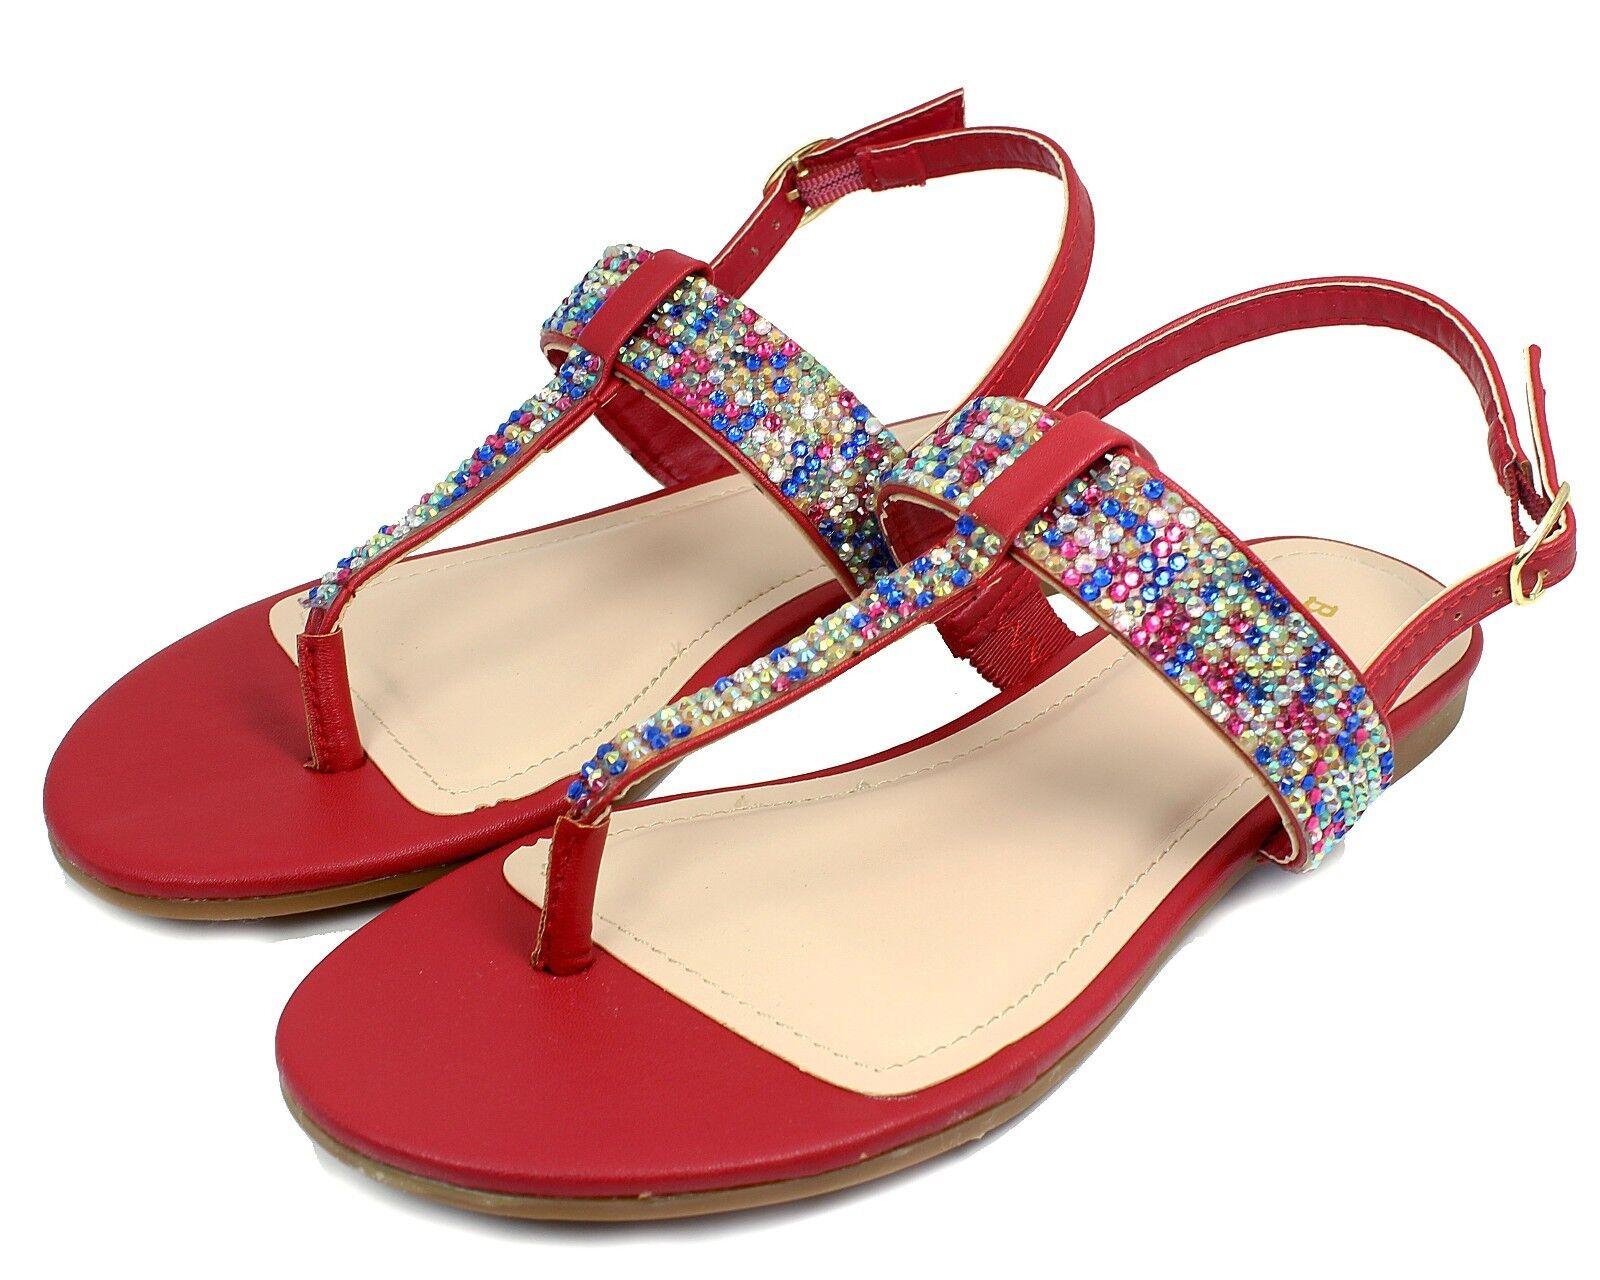 JOSALYN-22 Fushion Bead Party Flat T-Strap Cute Sandals Party Bead Women Shoes Red 6.5 31ecd7